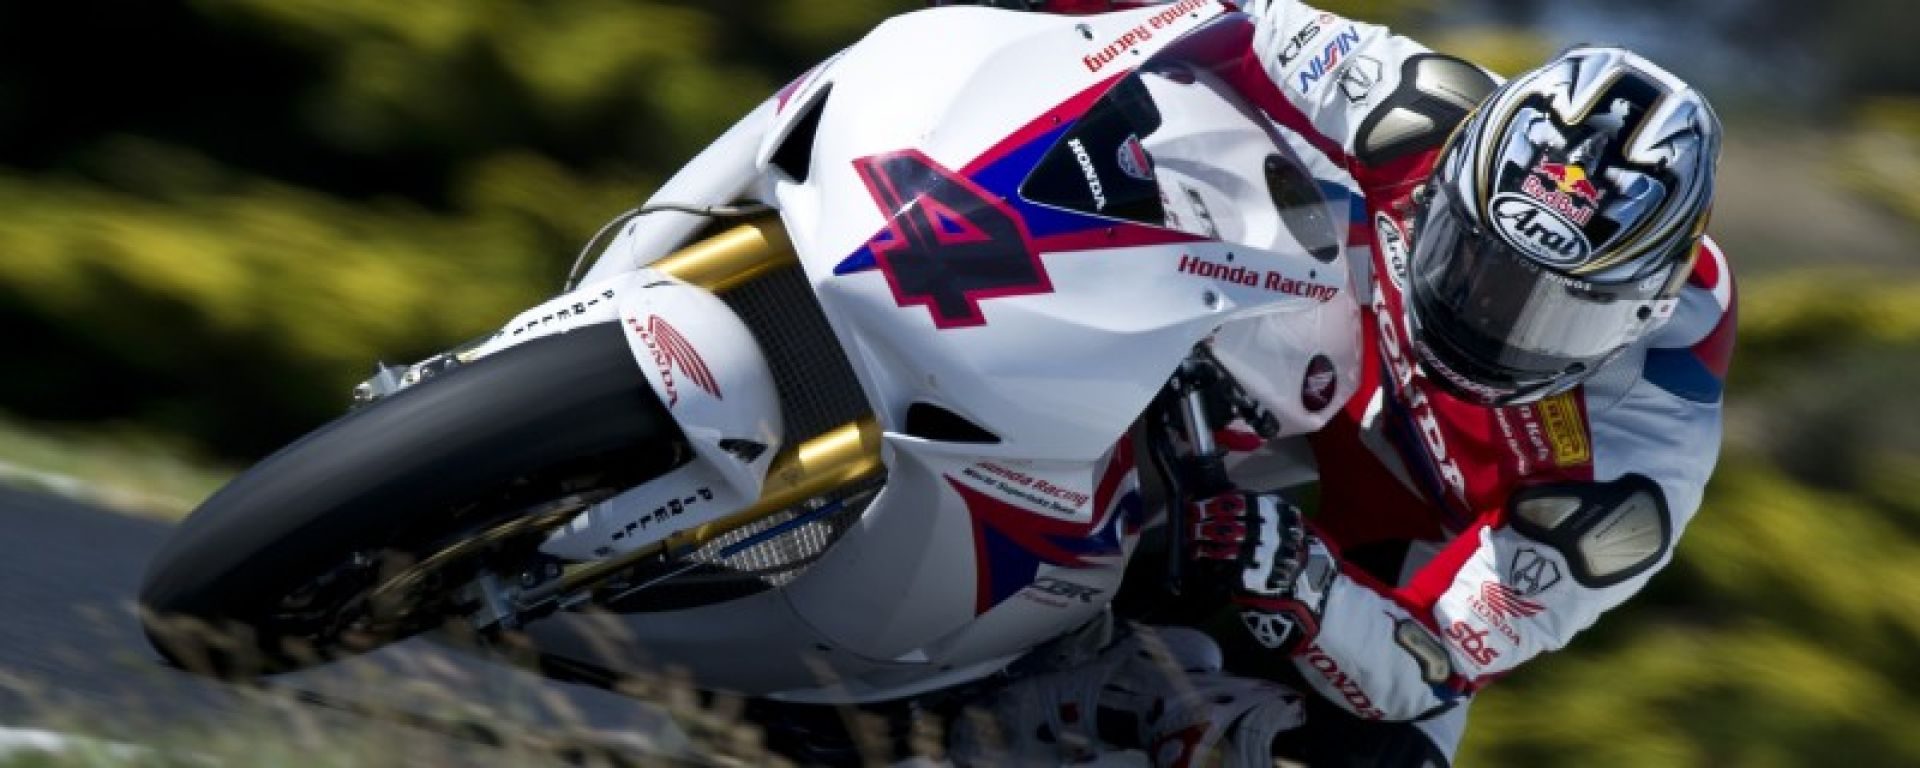 Honda: box aperto a Imola